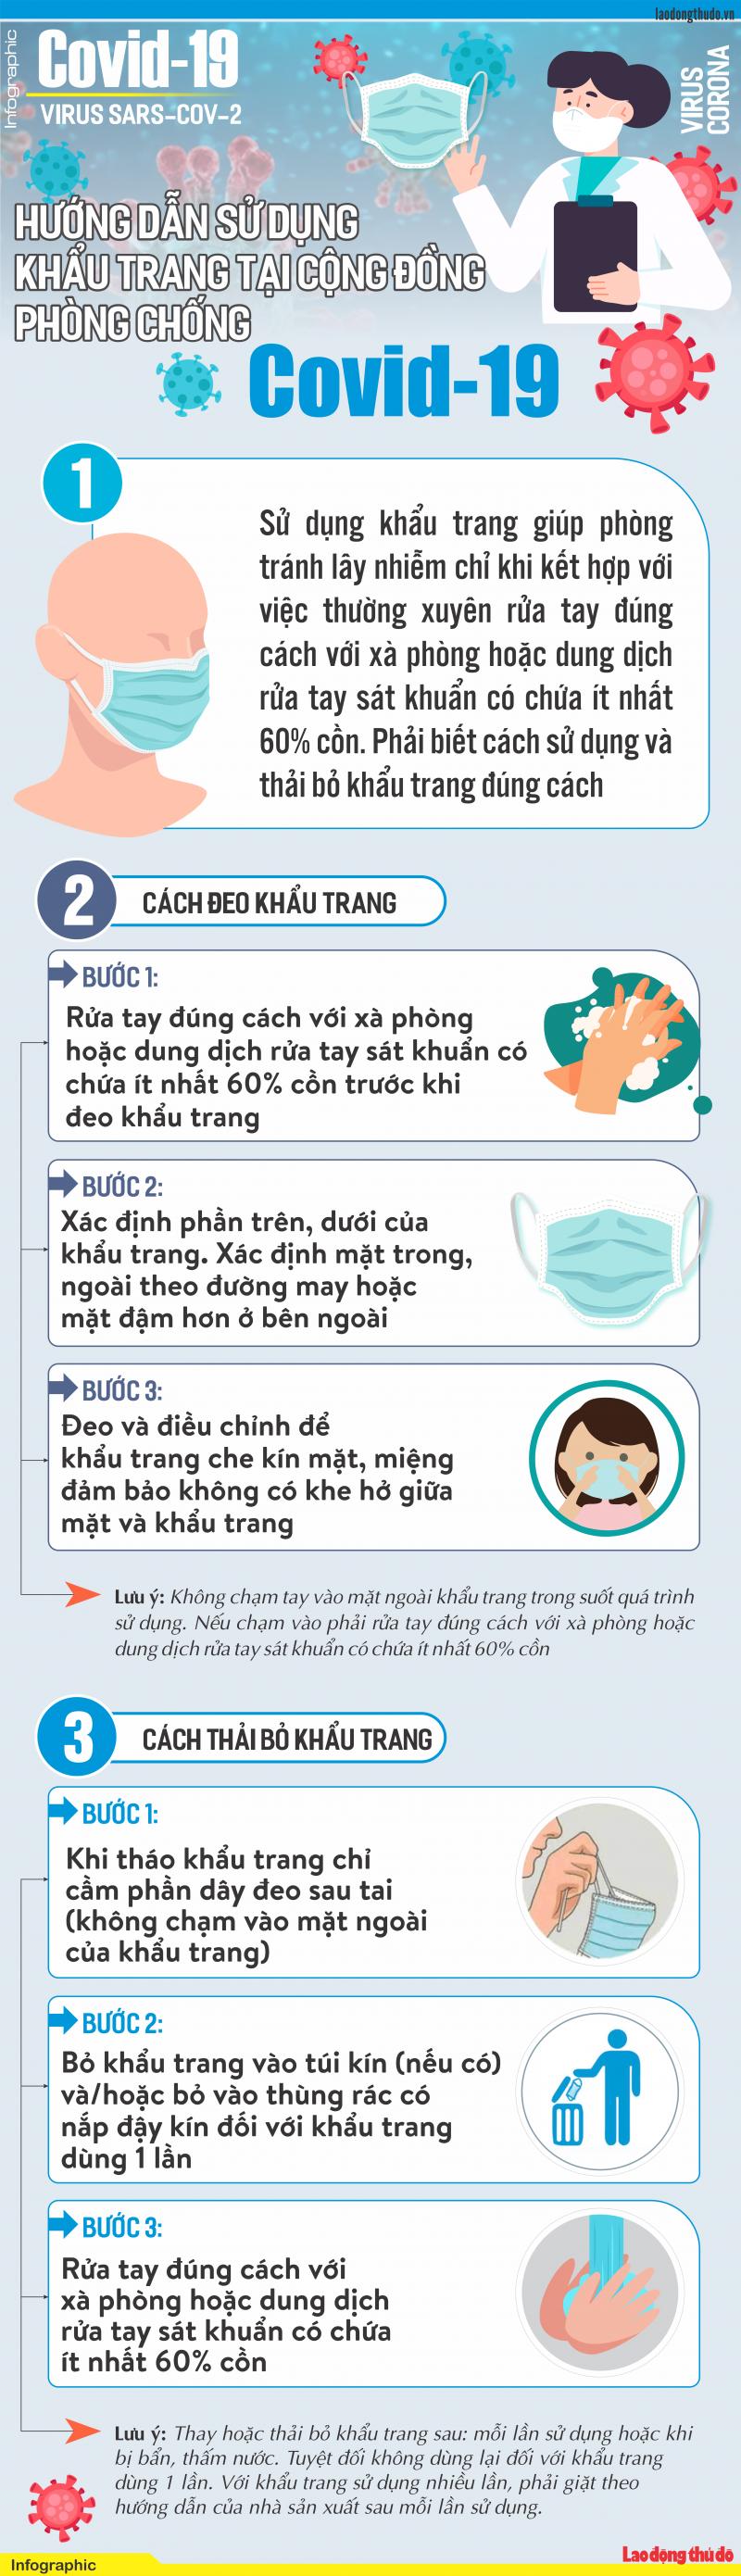 infographic huong dan su dung khau trang tai cong dong phong chong covid 19